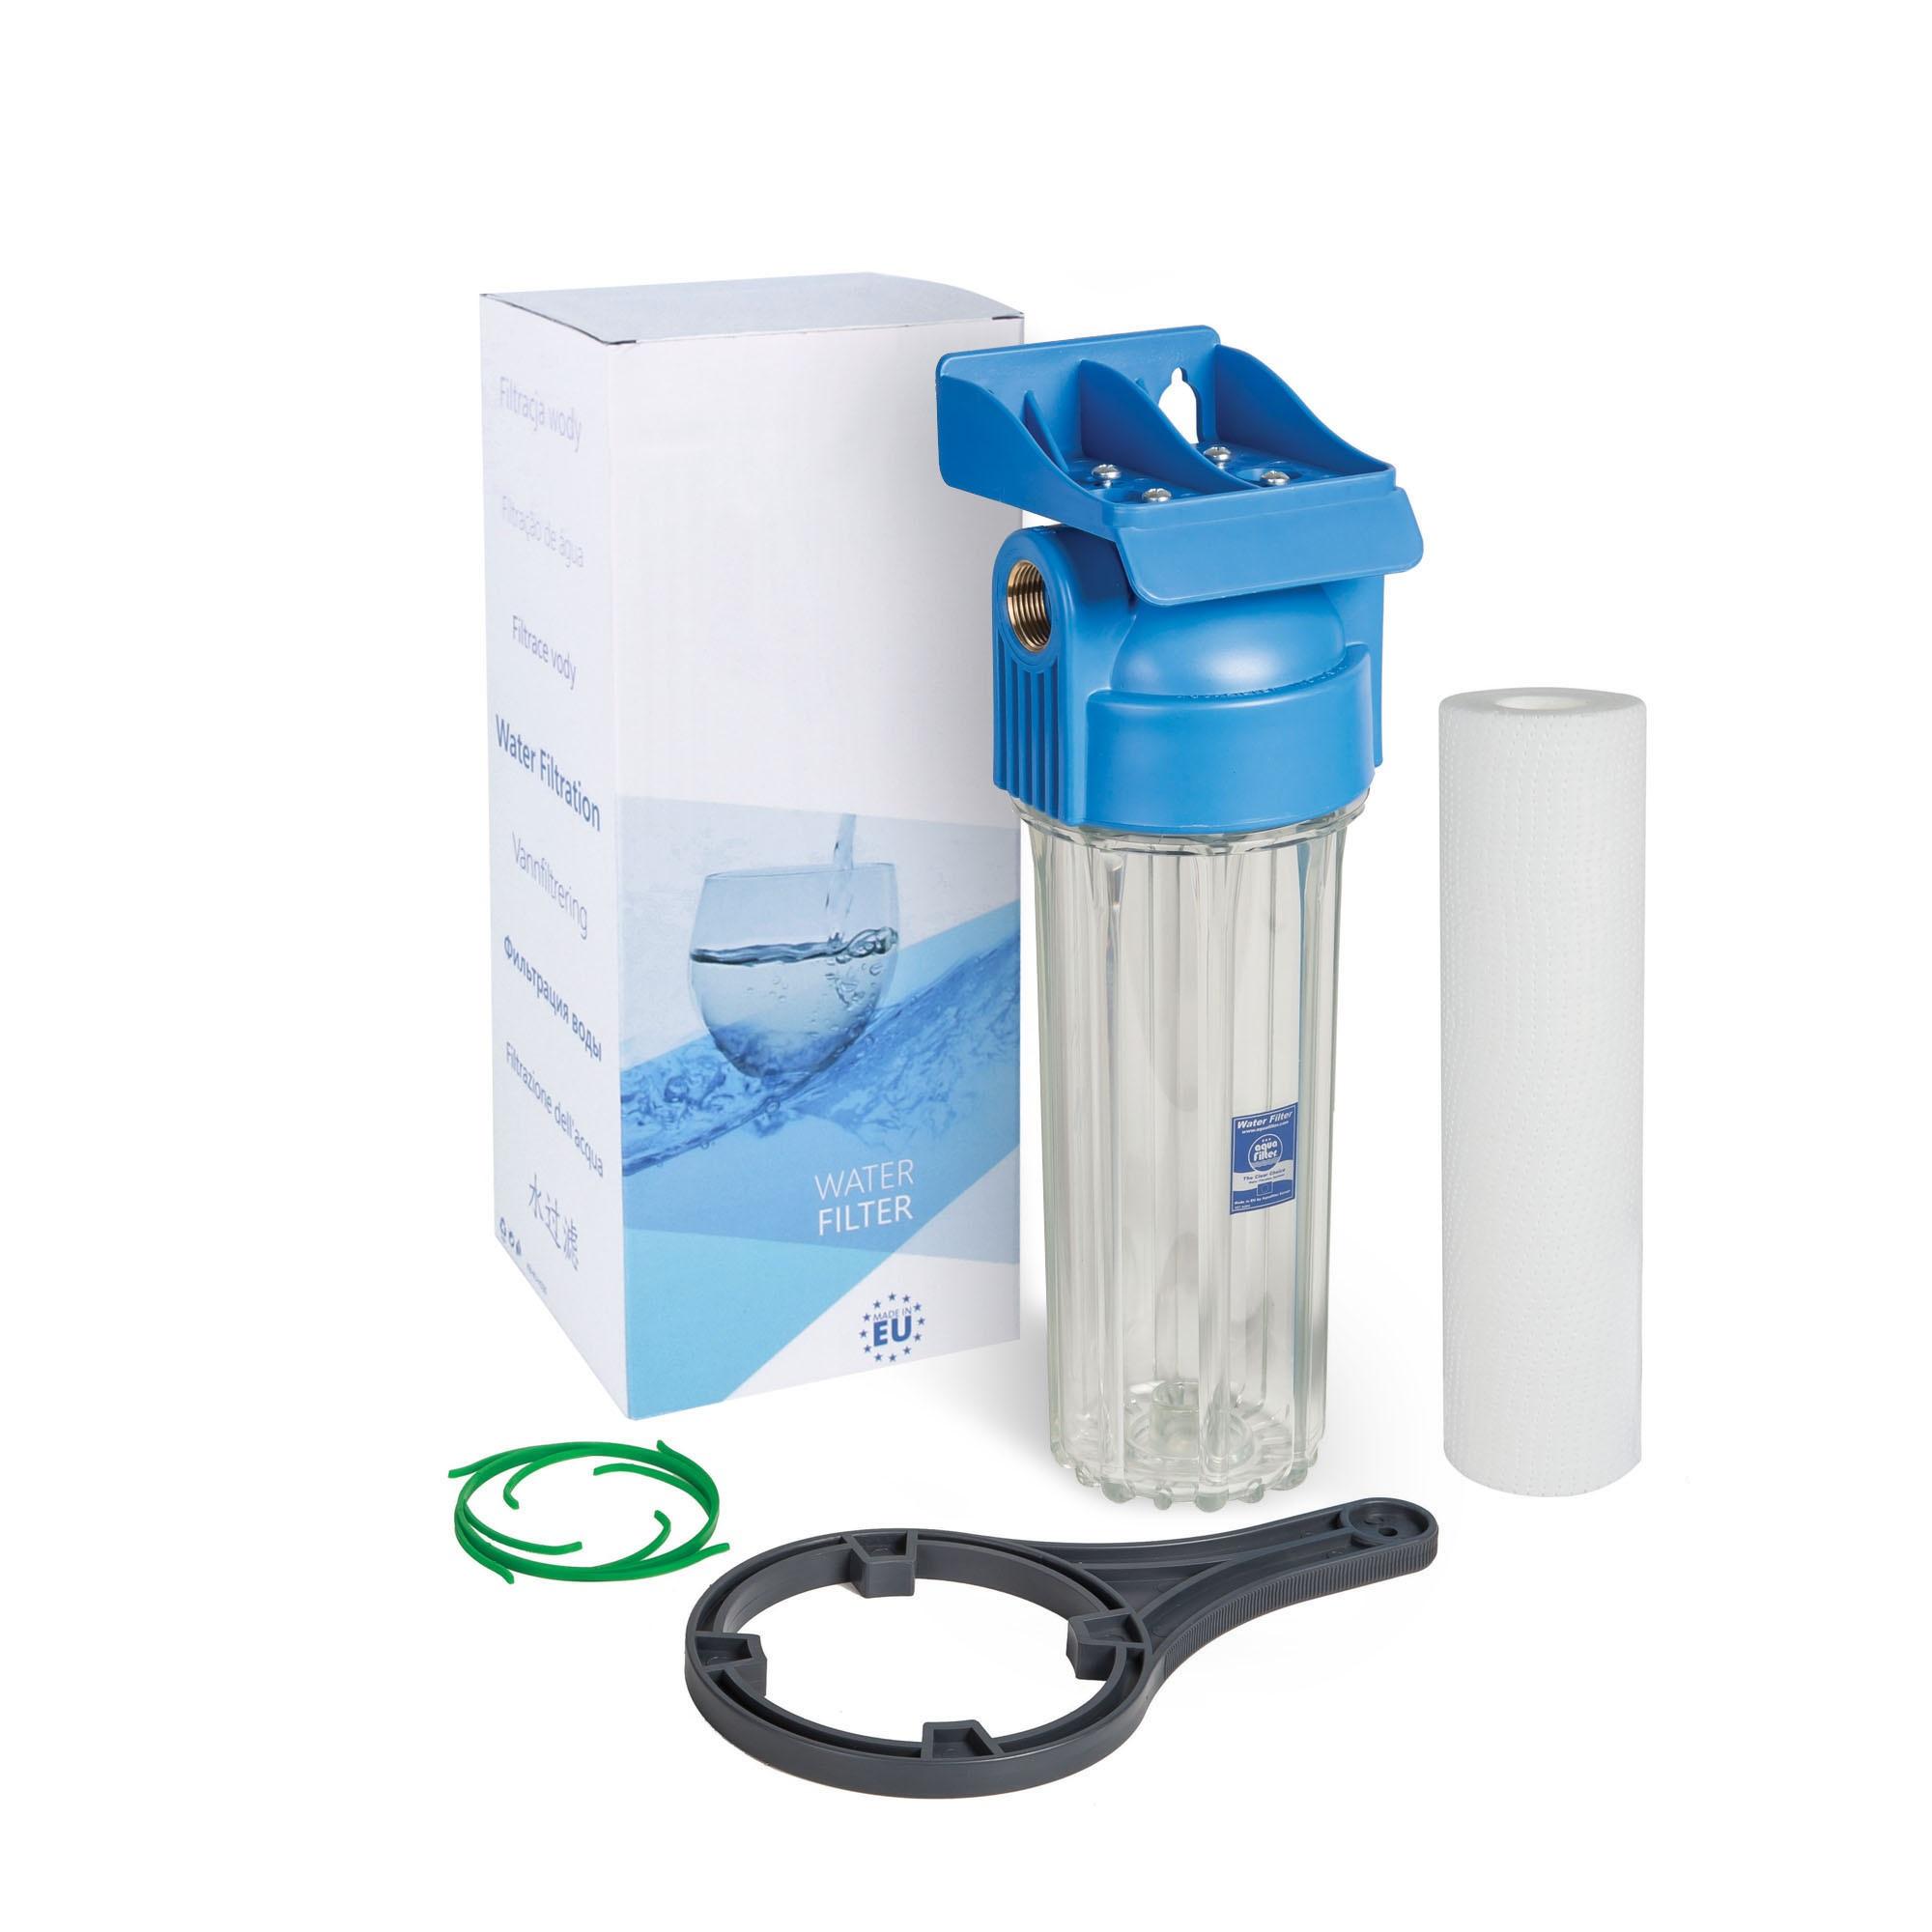 "Korpus 10"" + akcesoria Aquafilter"